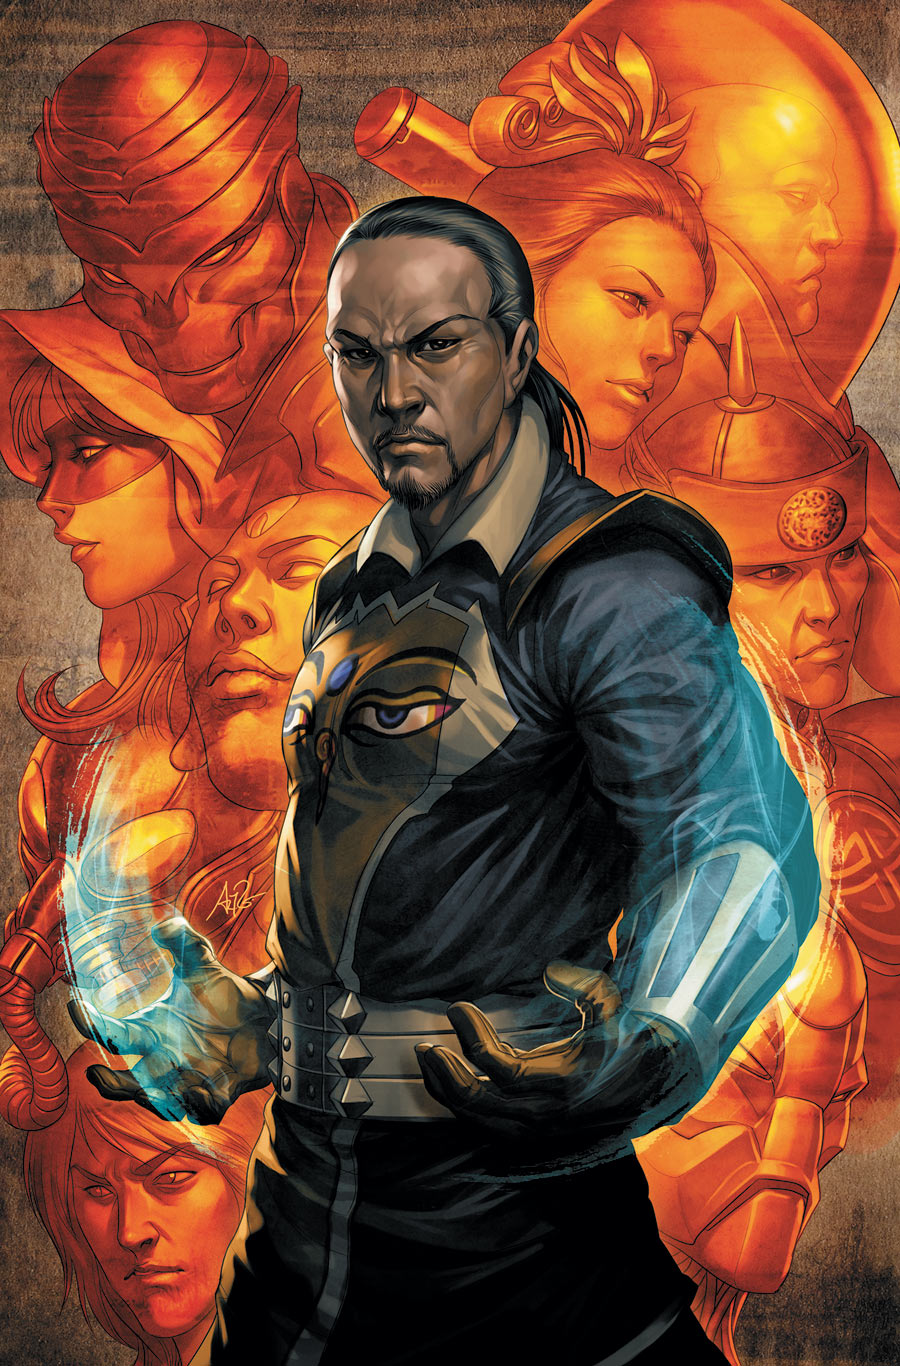 Arrow / The Flash The_Great_Ten_Vol_1_1_virgin